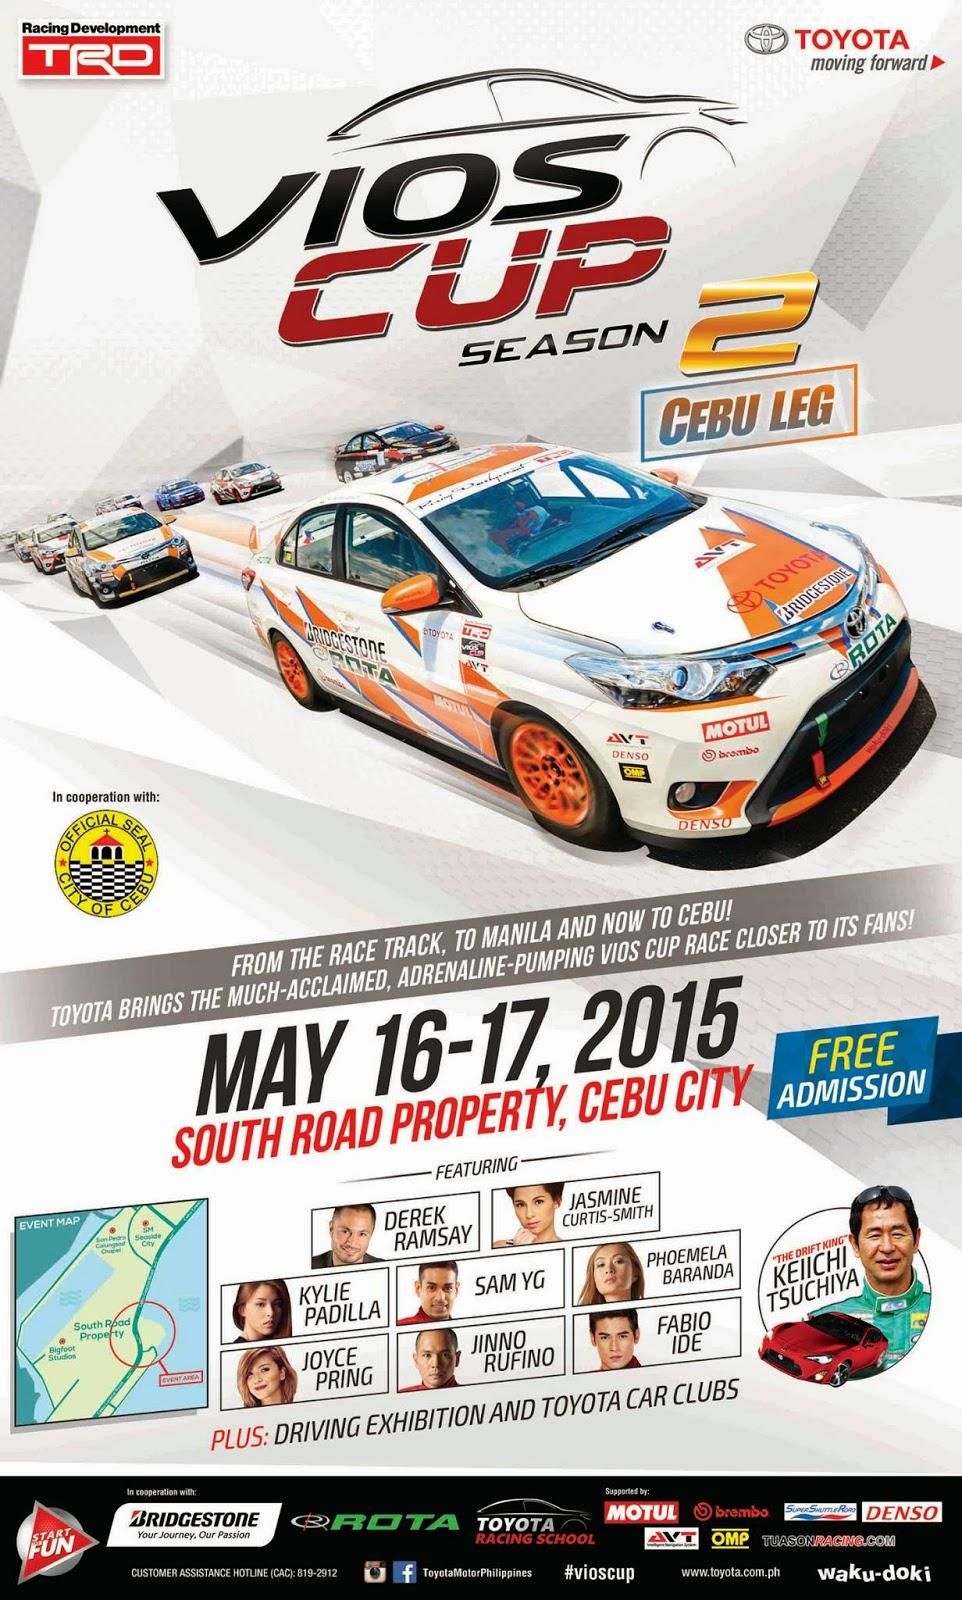 Vios-Cup-Season-2-Cebu-Leg